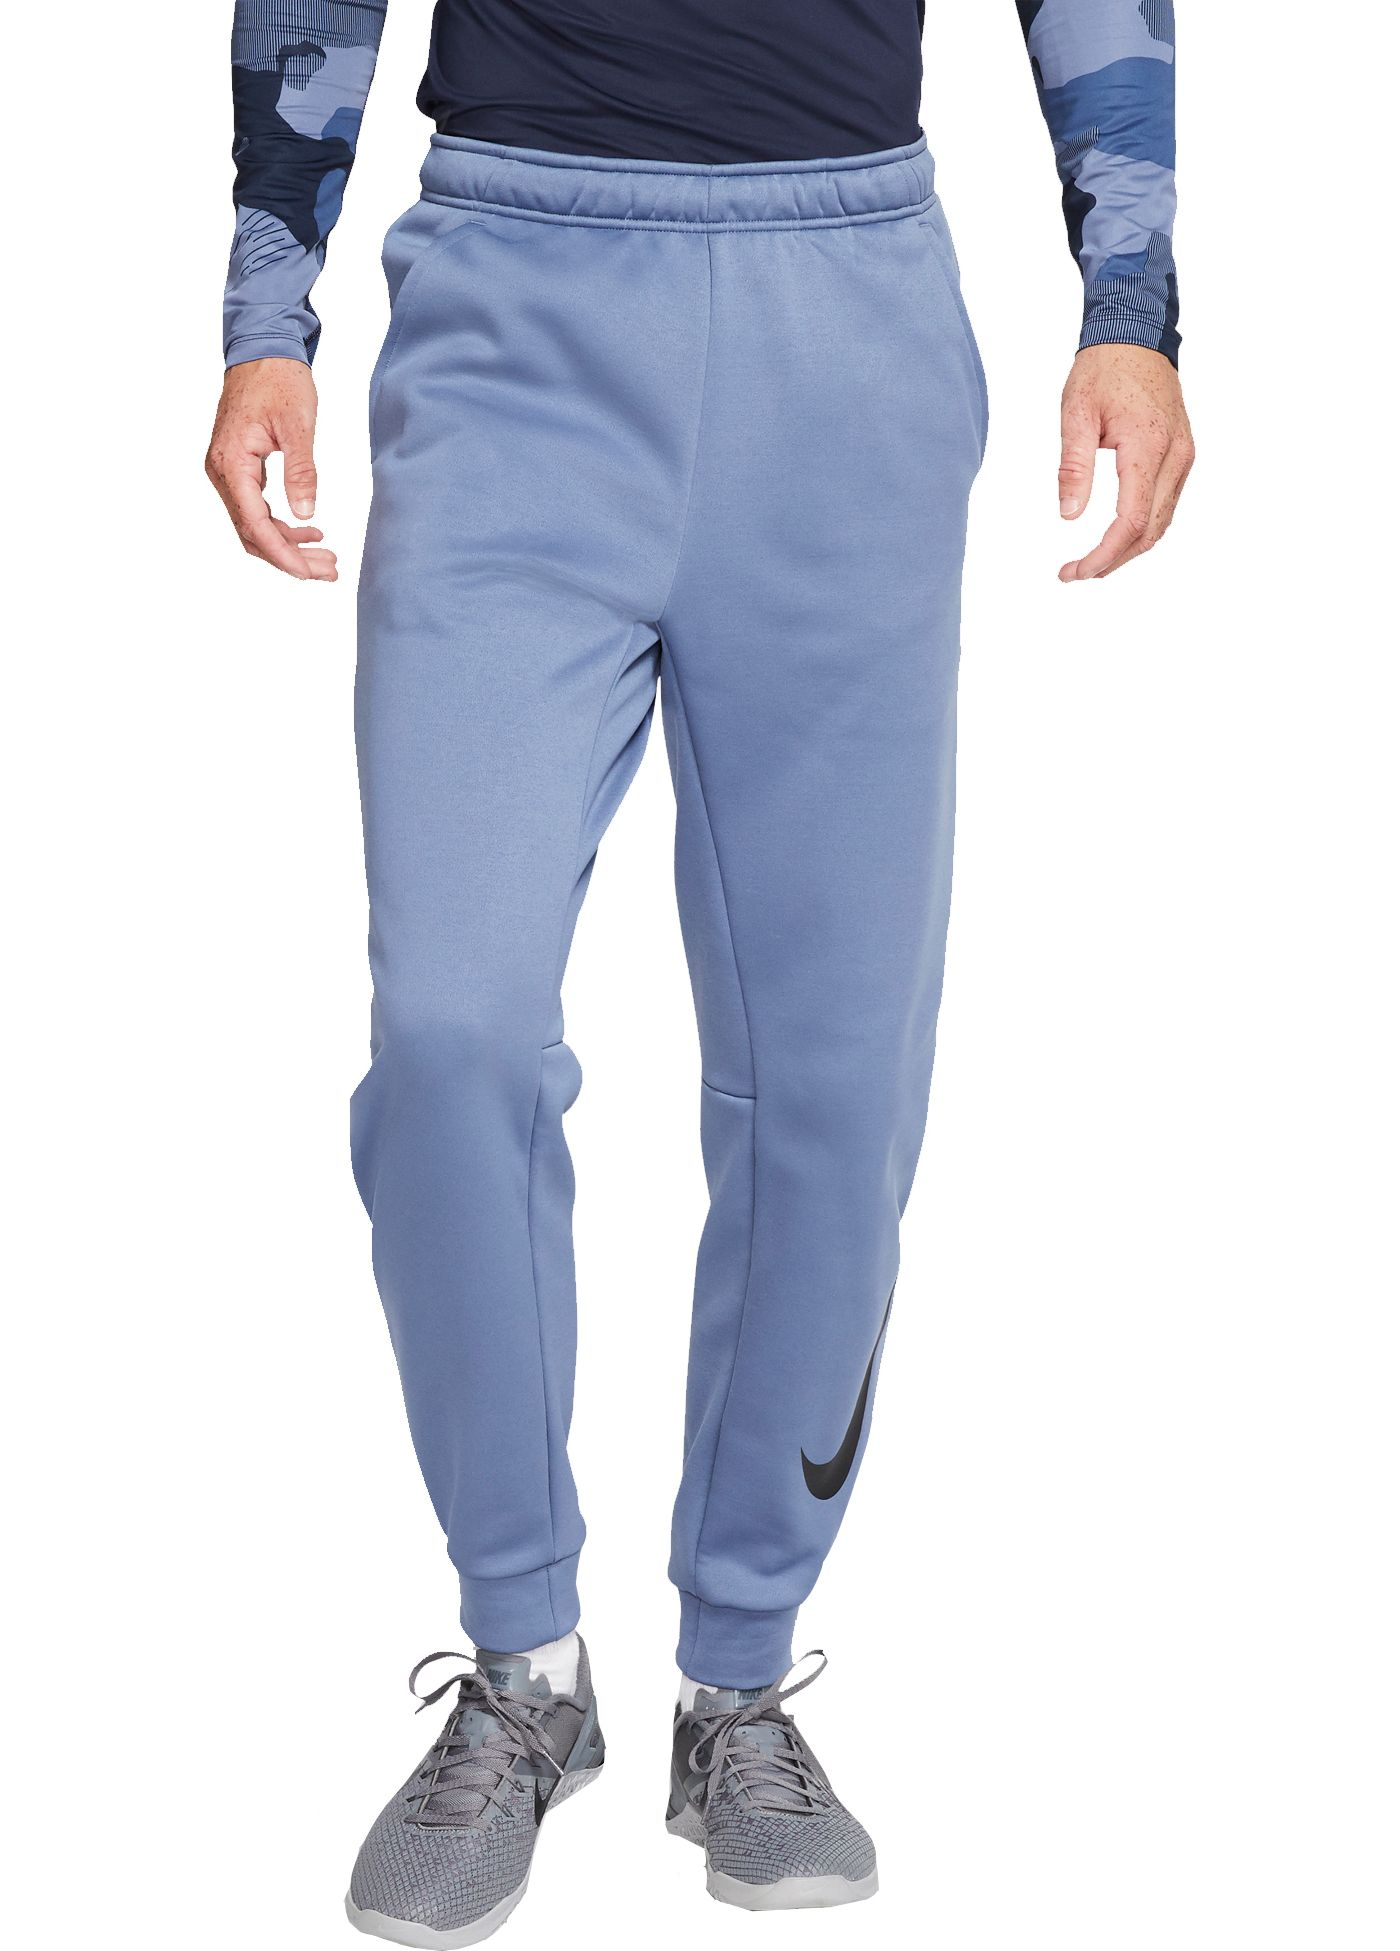 Nike Men's Therma Tapered Pants